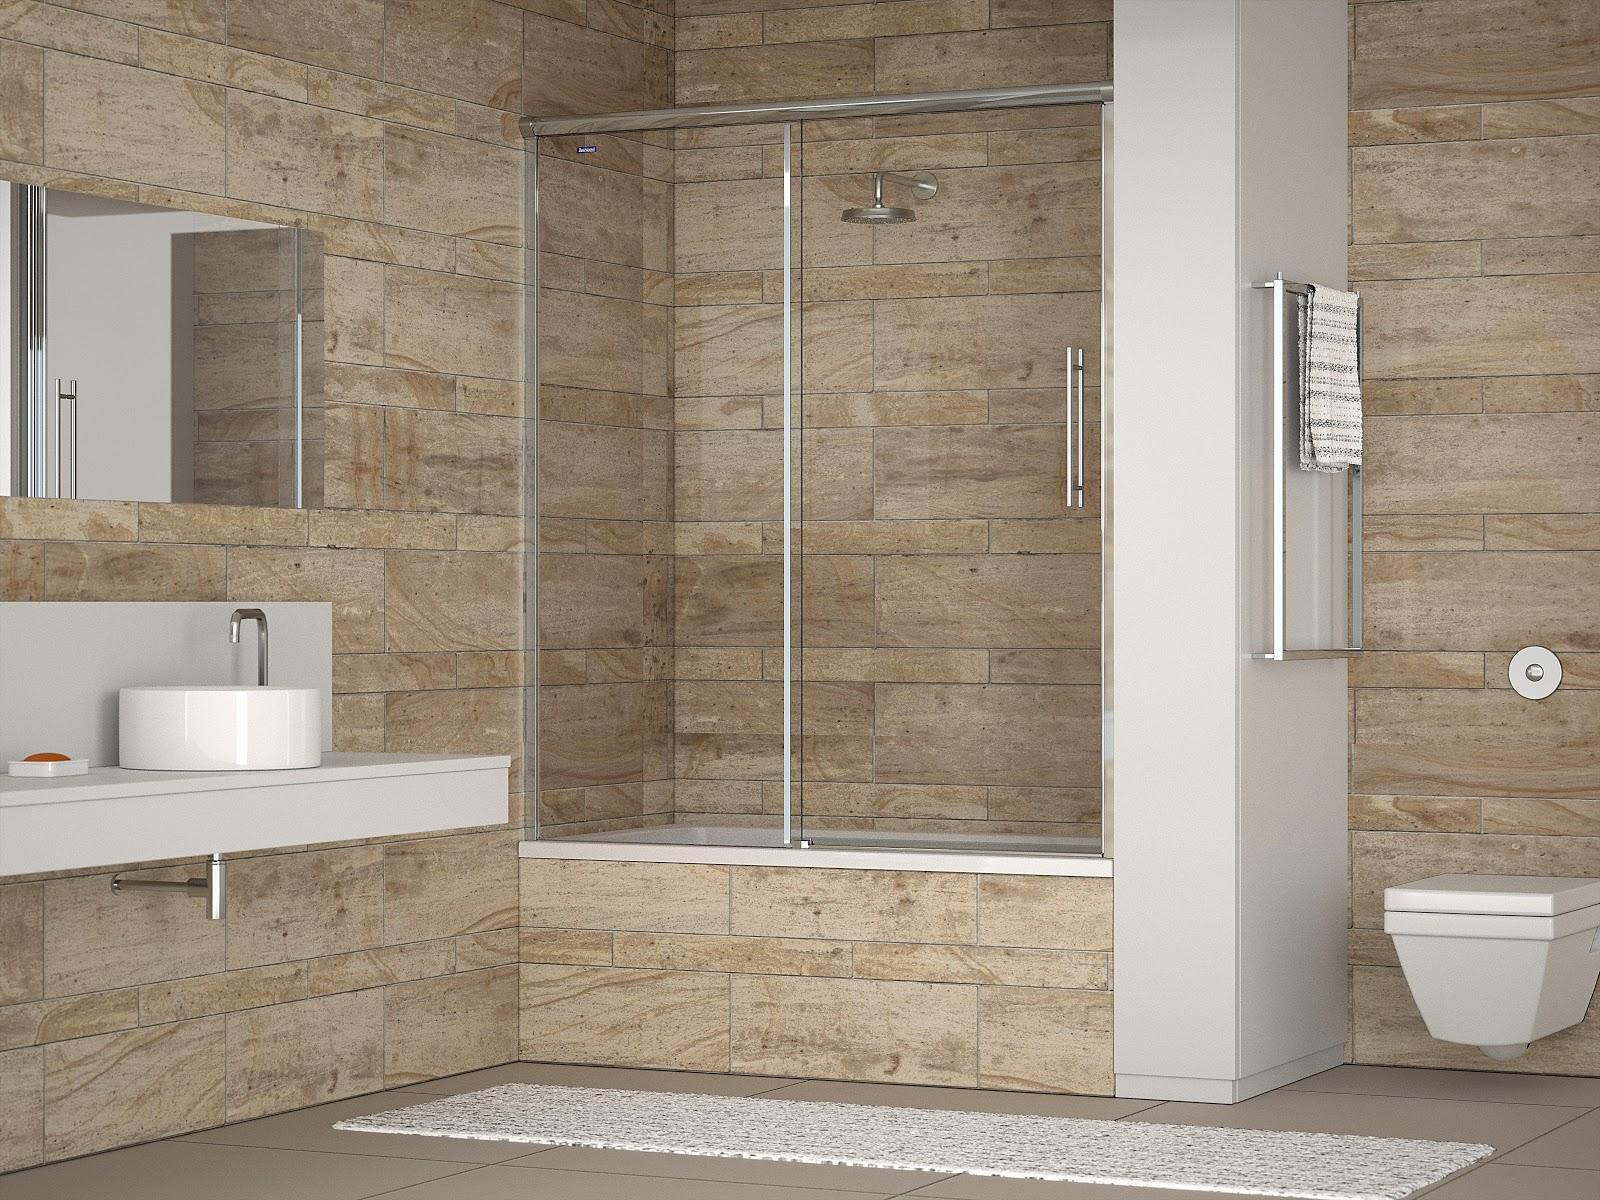 Baños Diseno Minimalista:Mamparas DUSCHOLUX: Un baño minimalista